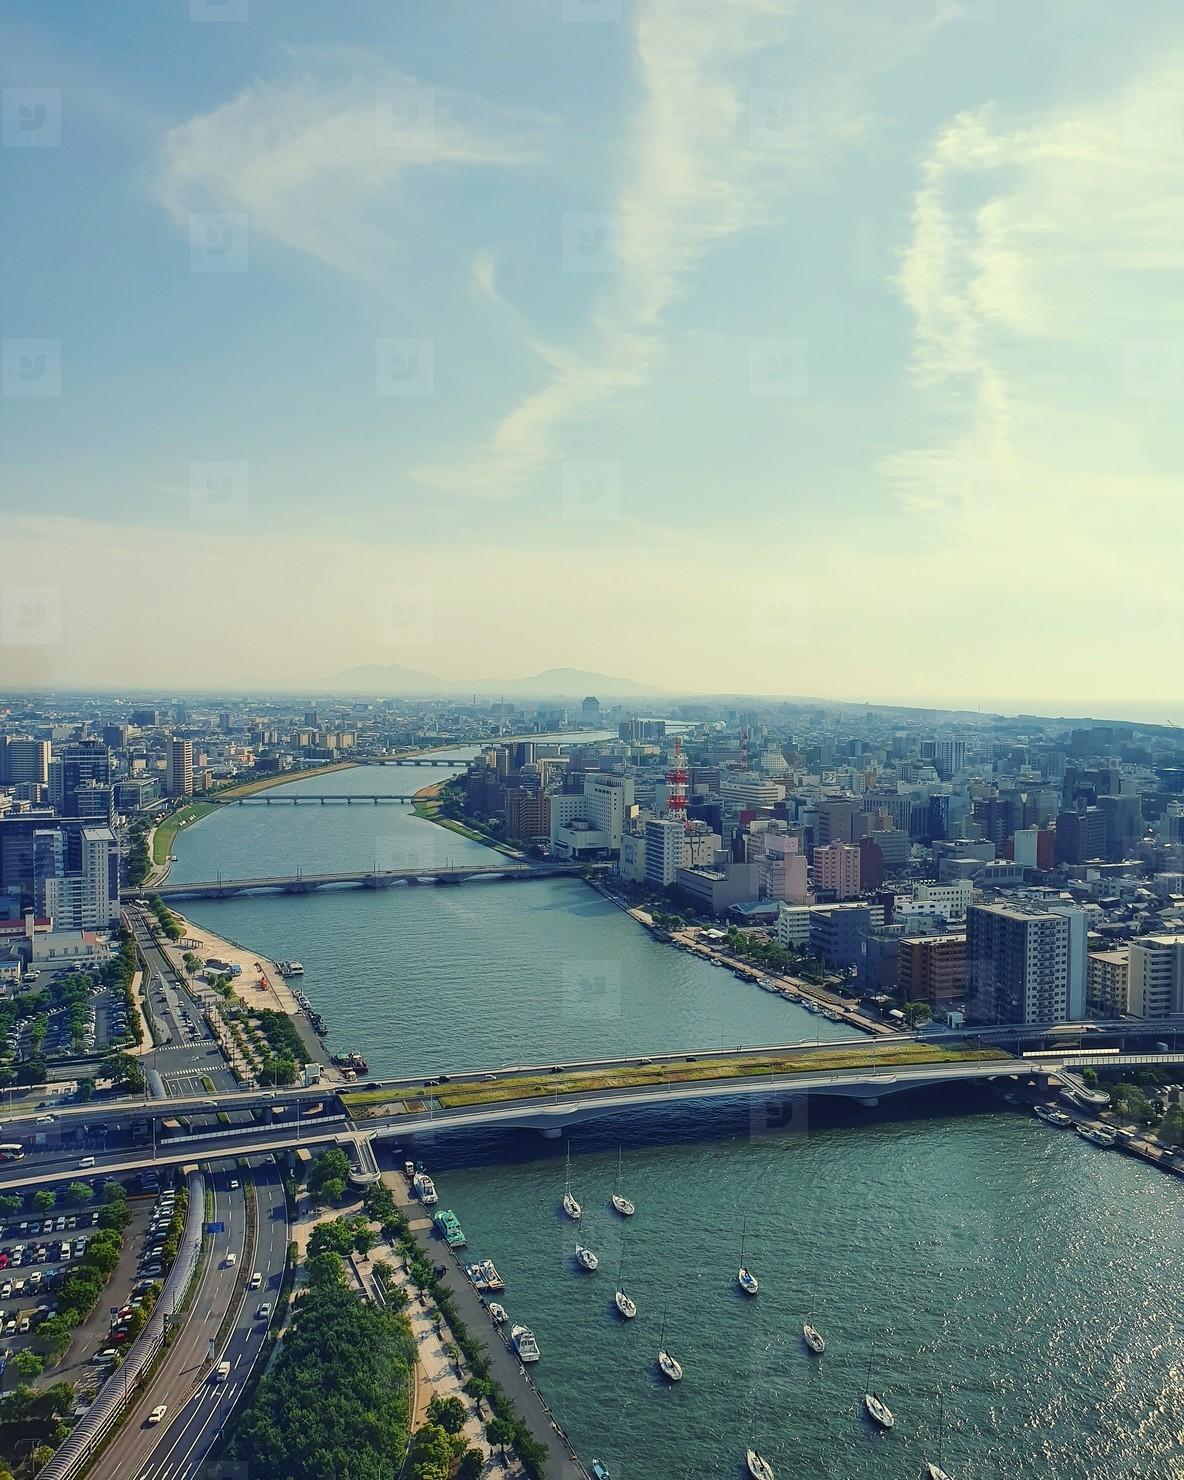 Aerial cityscape